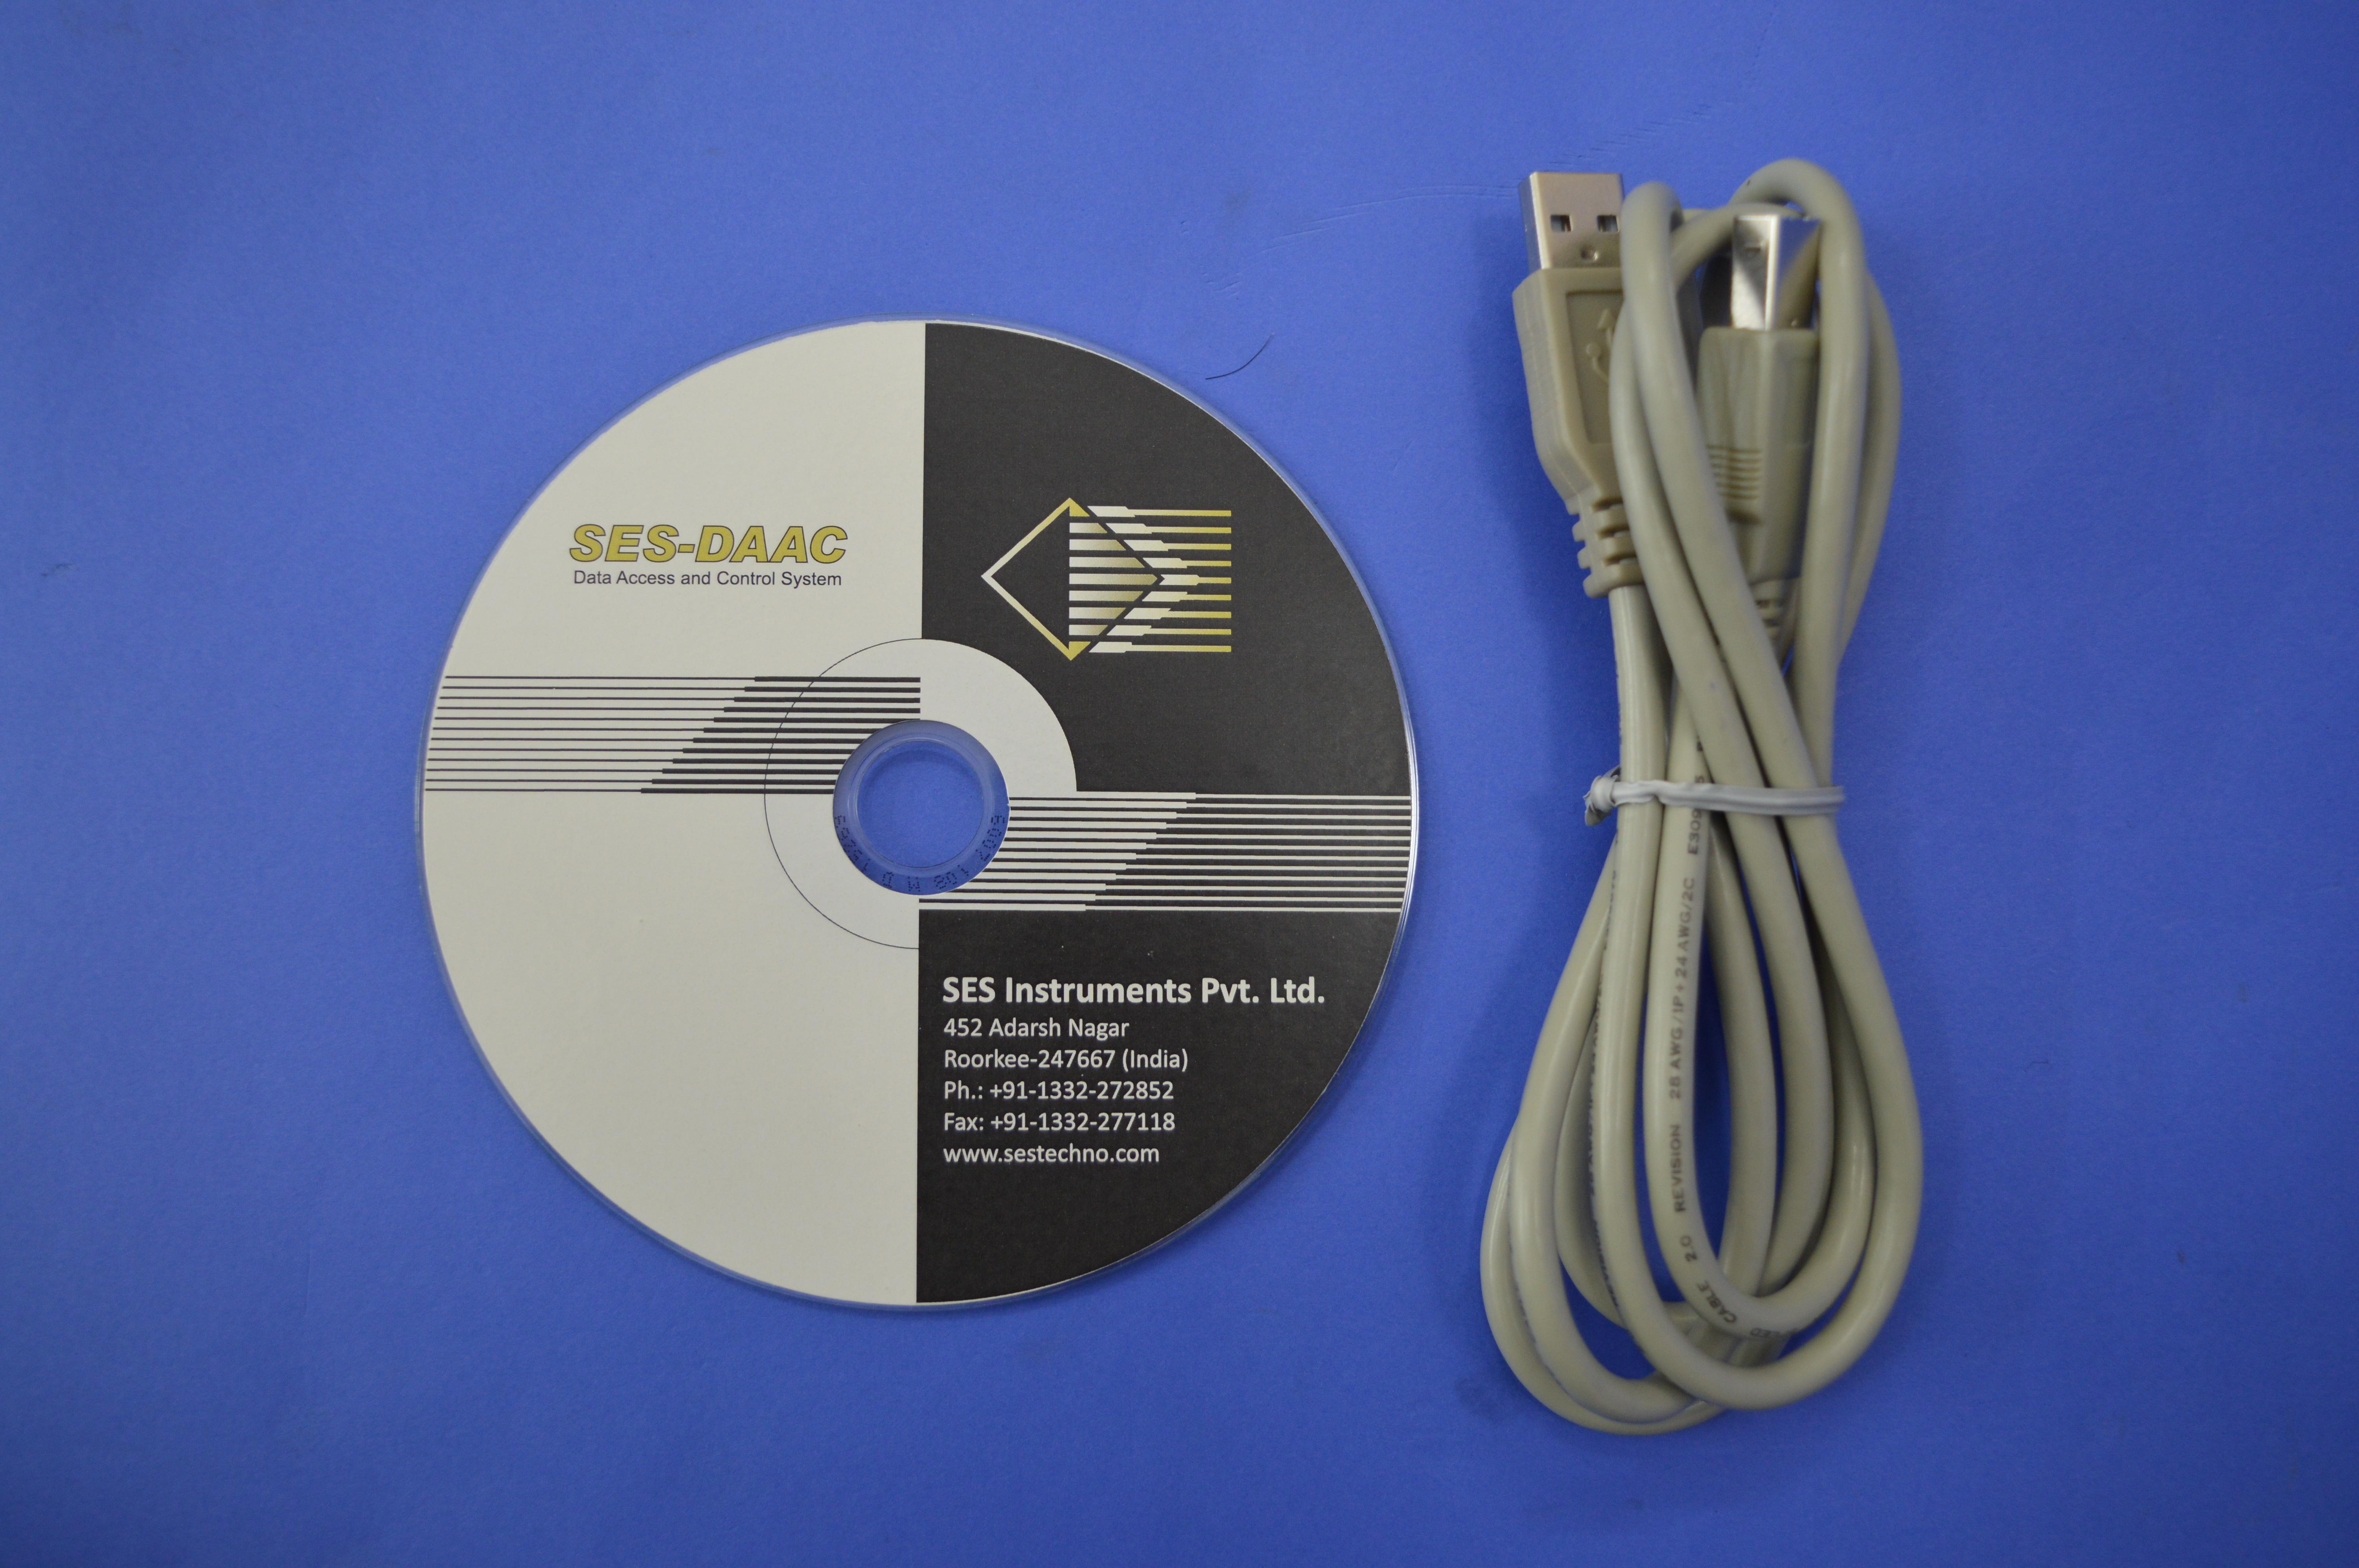 Digital Microvoltmeter (DMV-001-C2)